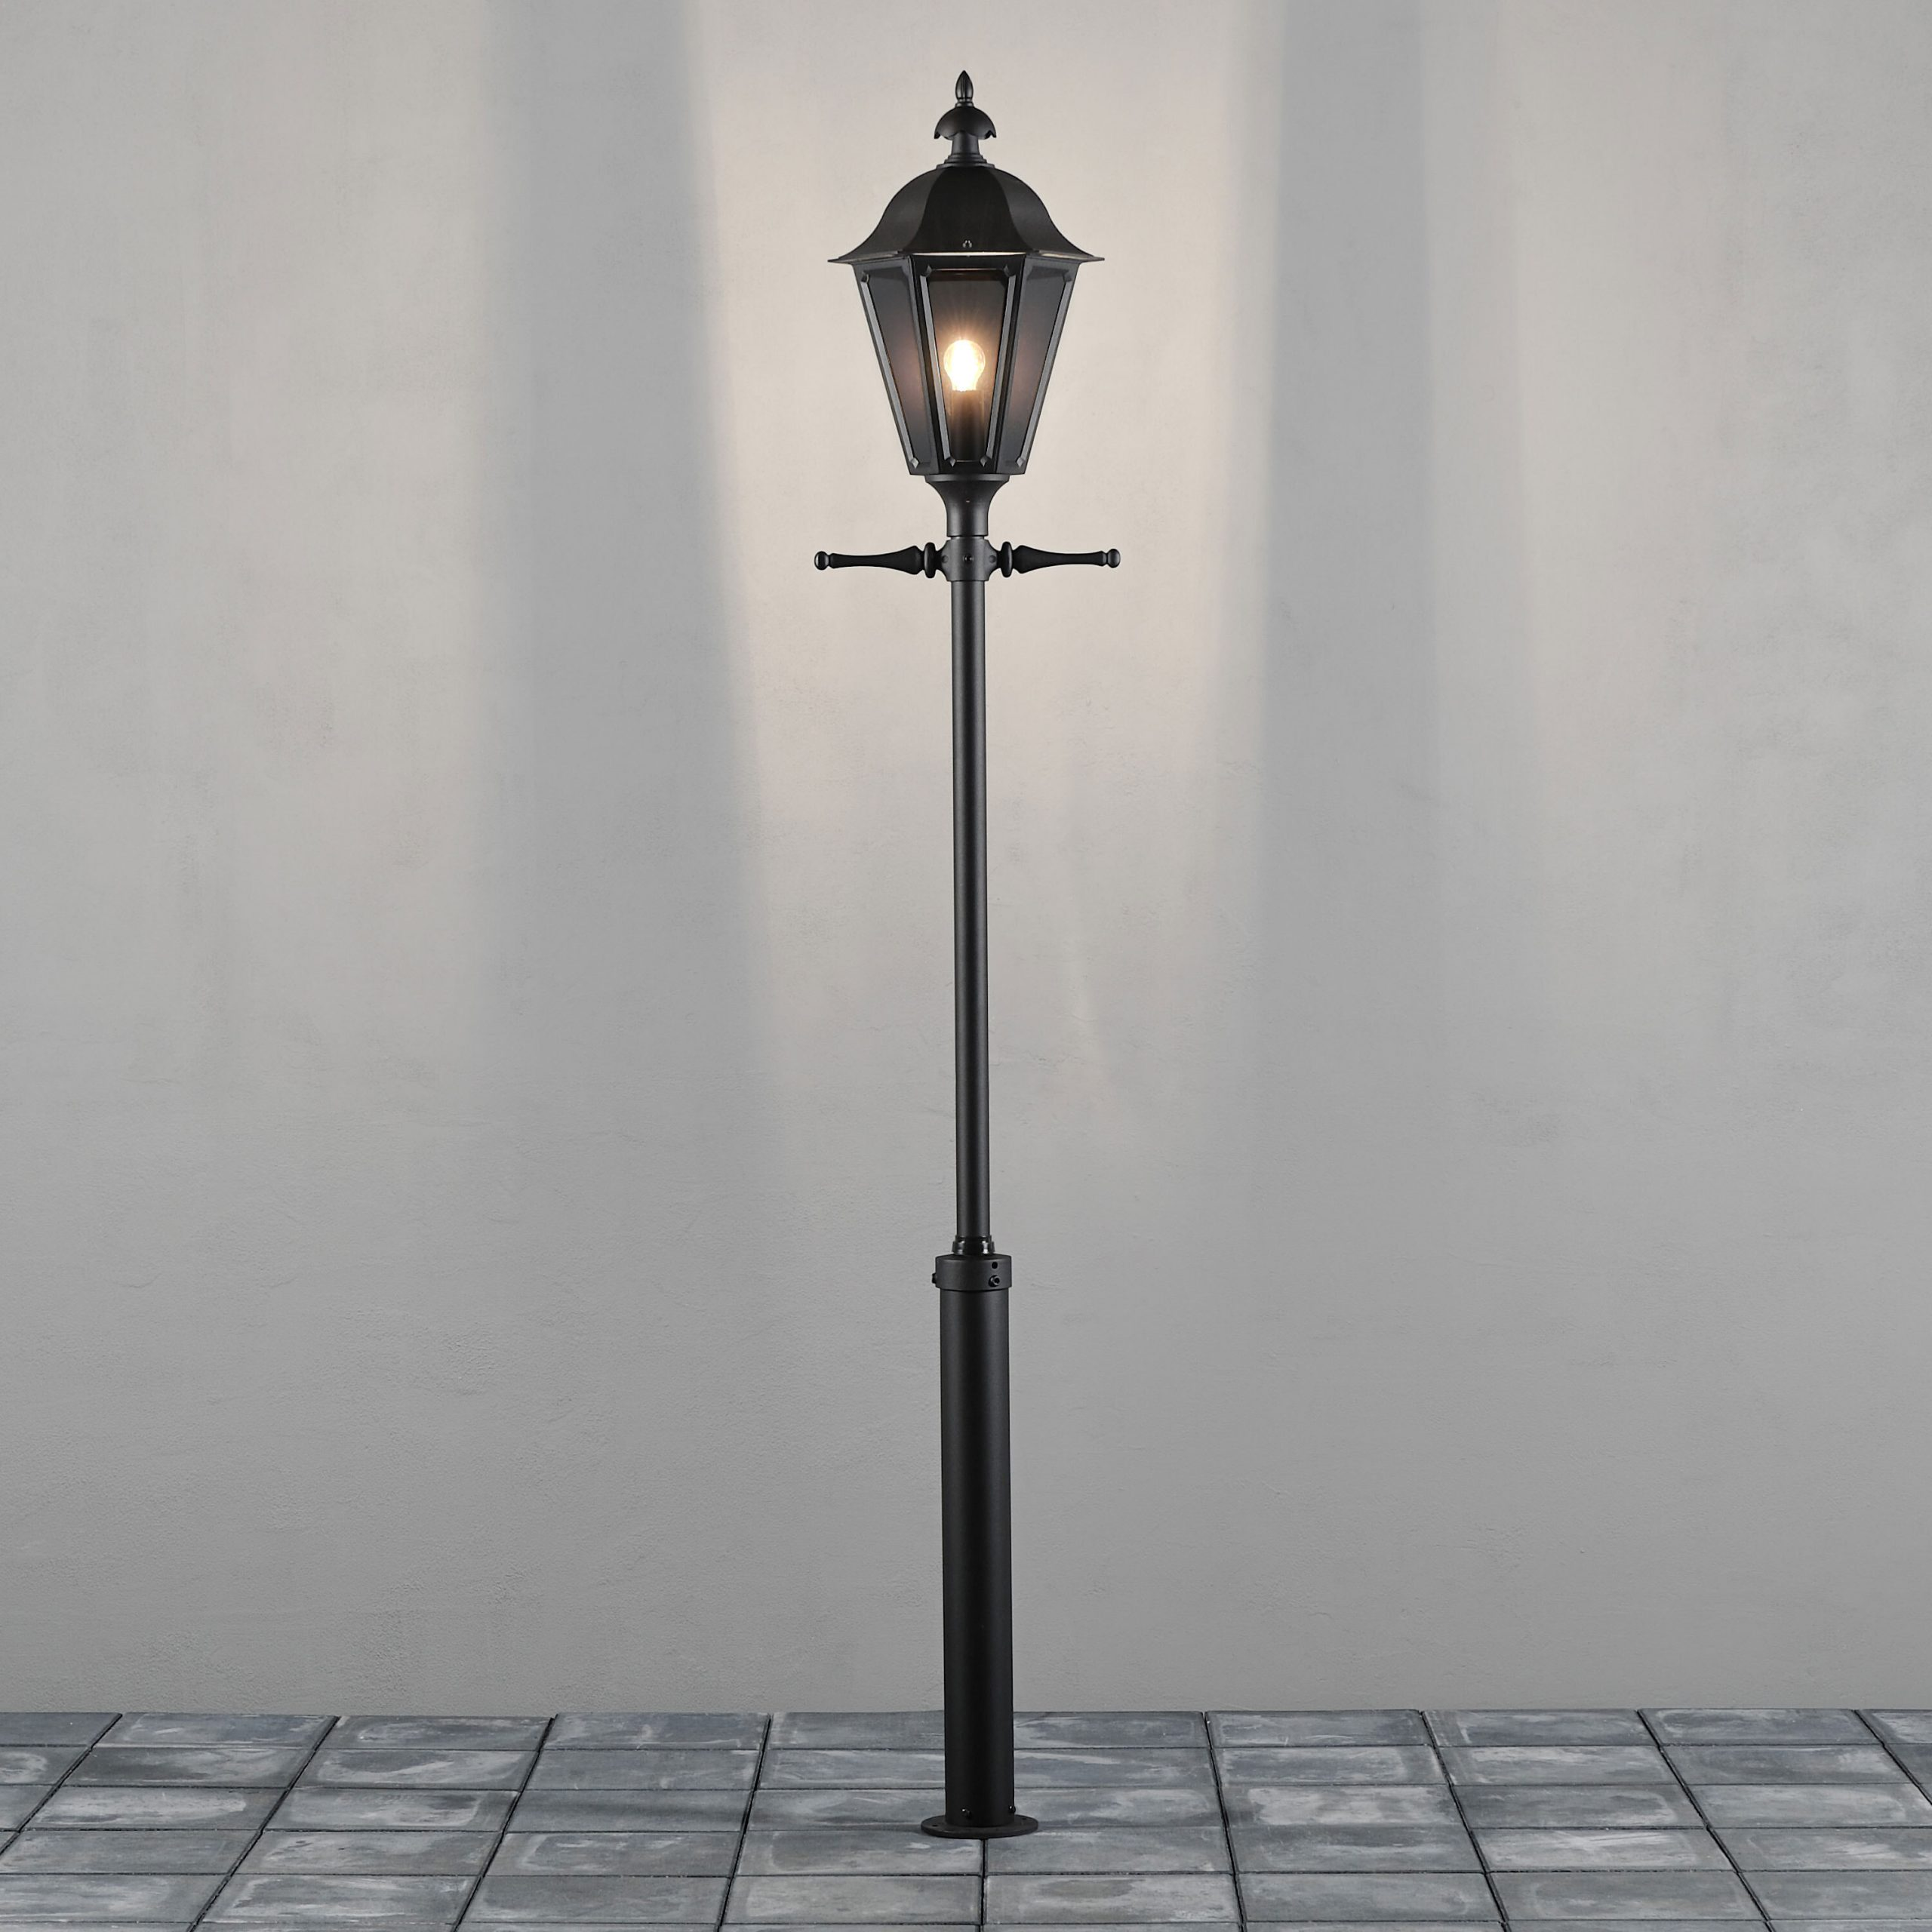 Konstsmide Staande Buitenlamp 'Pallas' 260cm hoog, E27 max 100W / 230V, kleur Zwart | Konstsmide